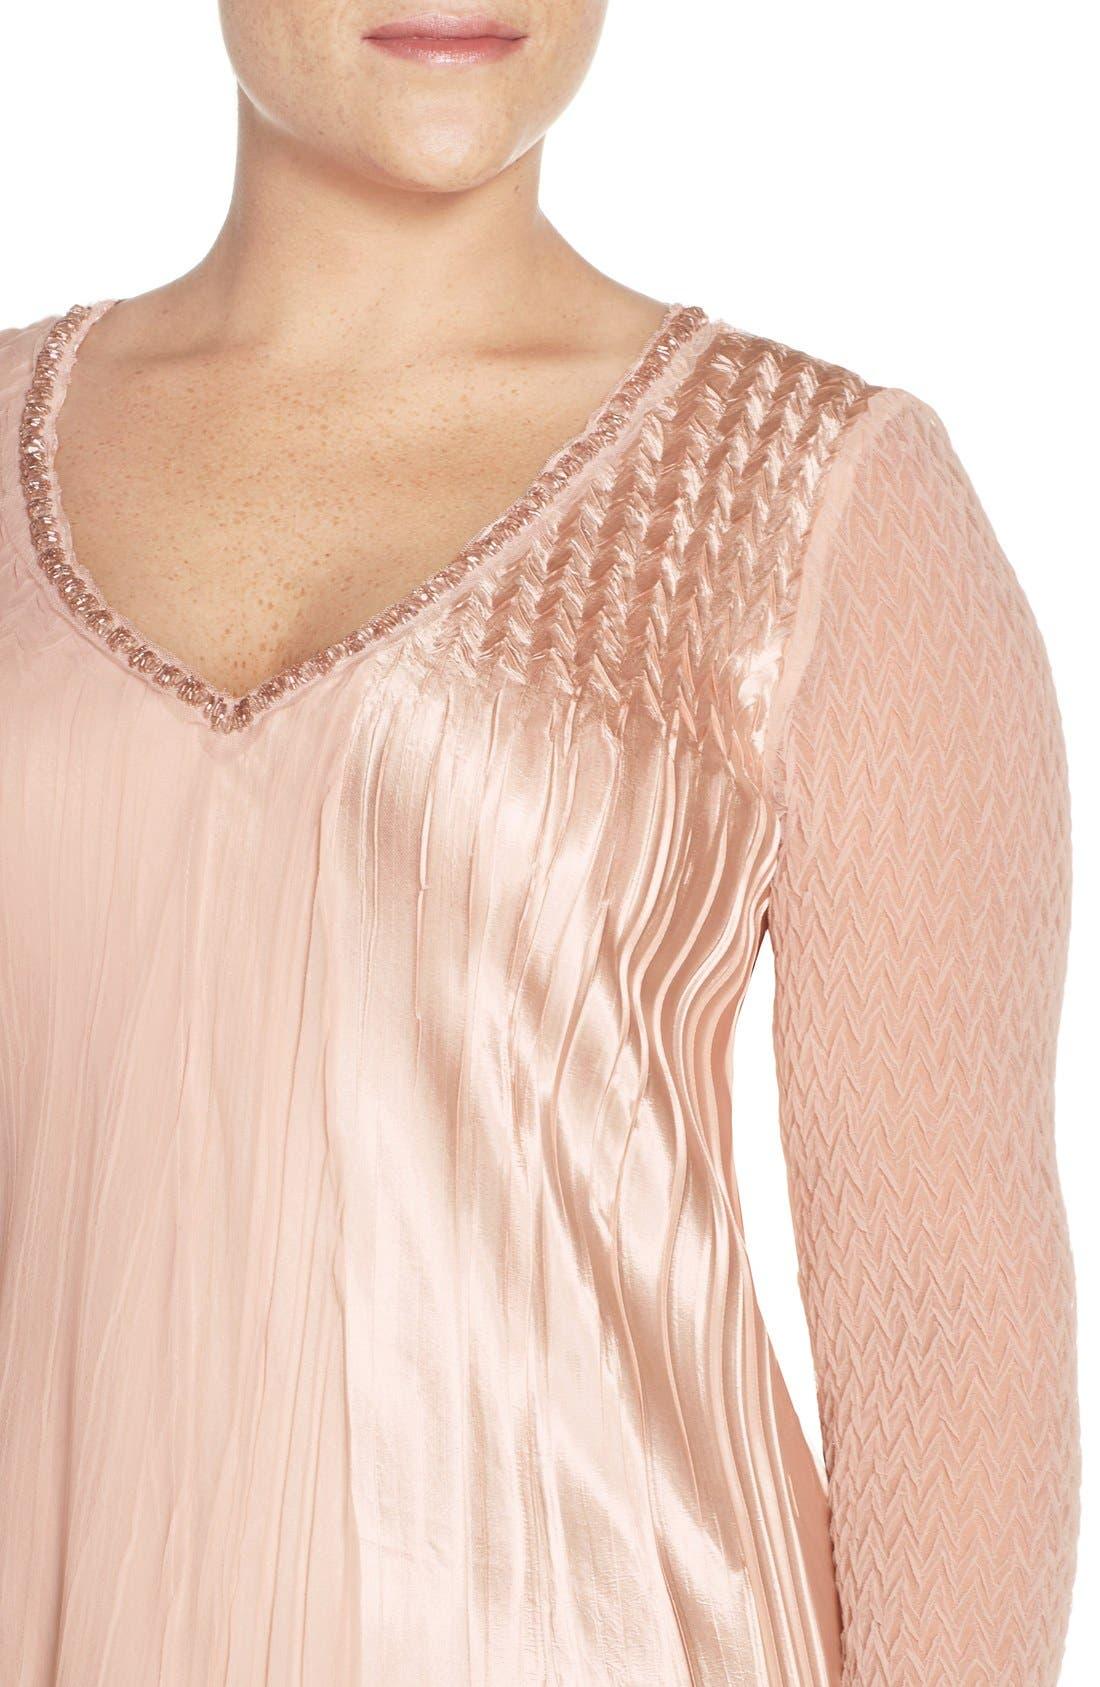 V-Neck Tiered Chiffon & Charmeuse A-Line Dress,                             Alternate thumbnail 4, color,                             Vintage Rose